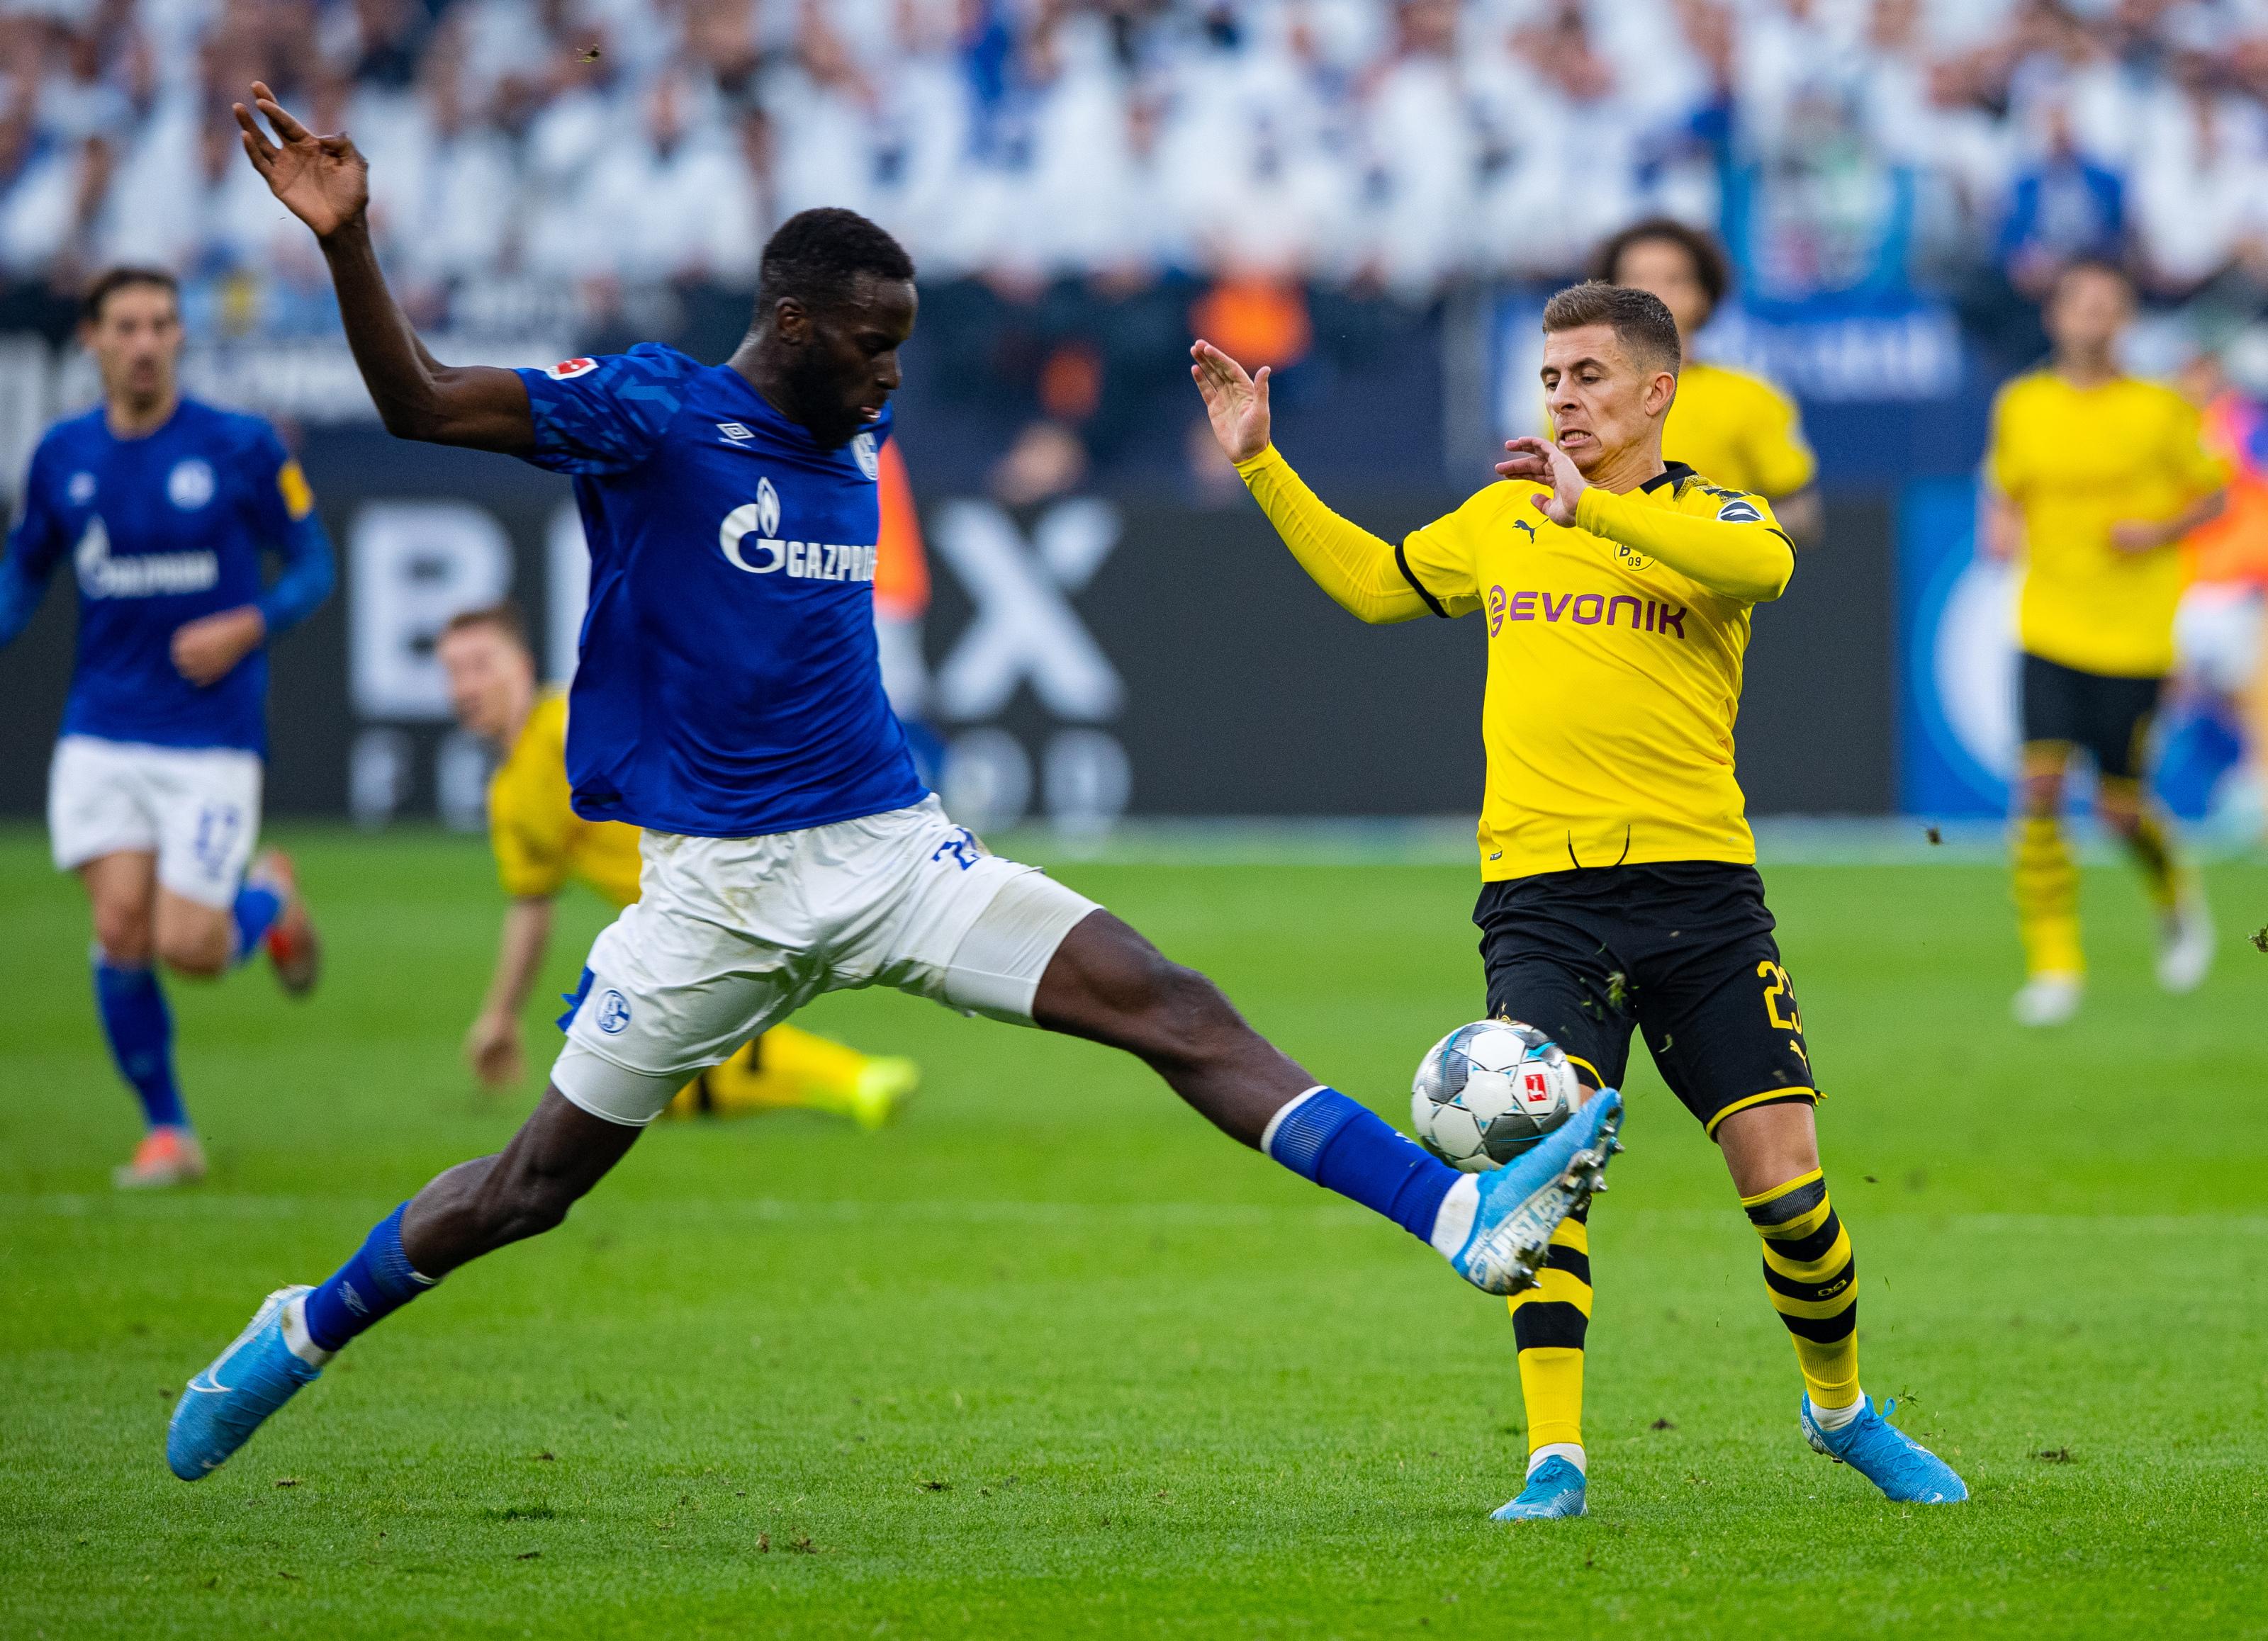 Sane Schalke 04